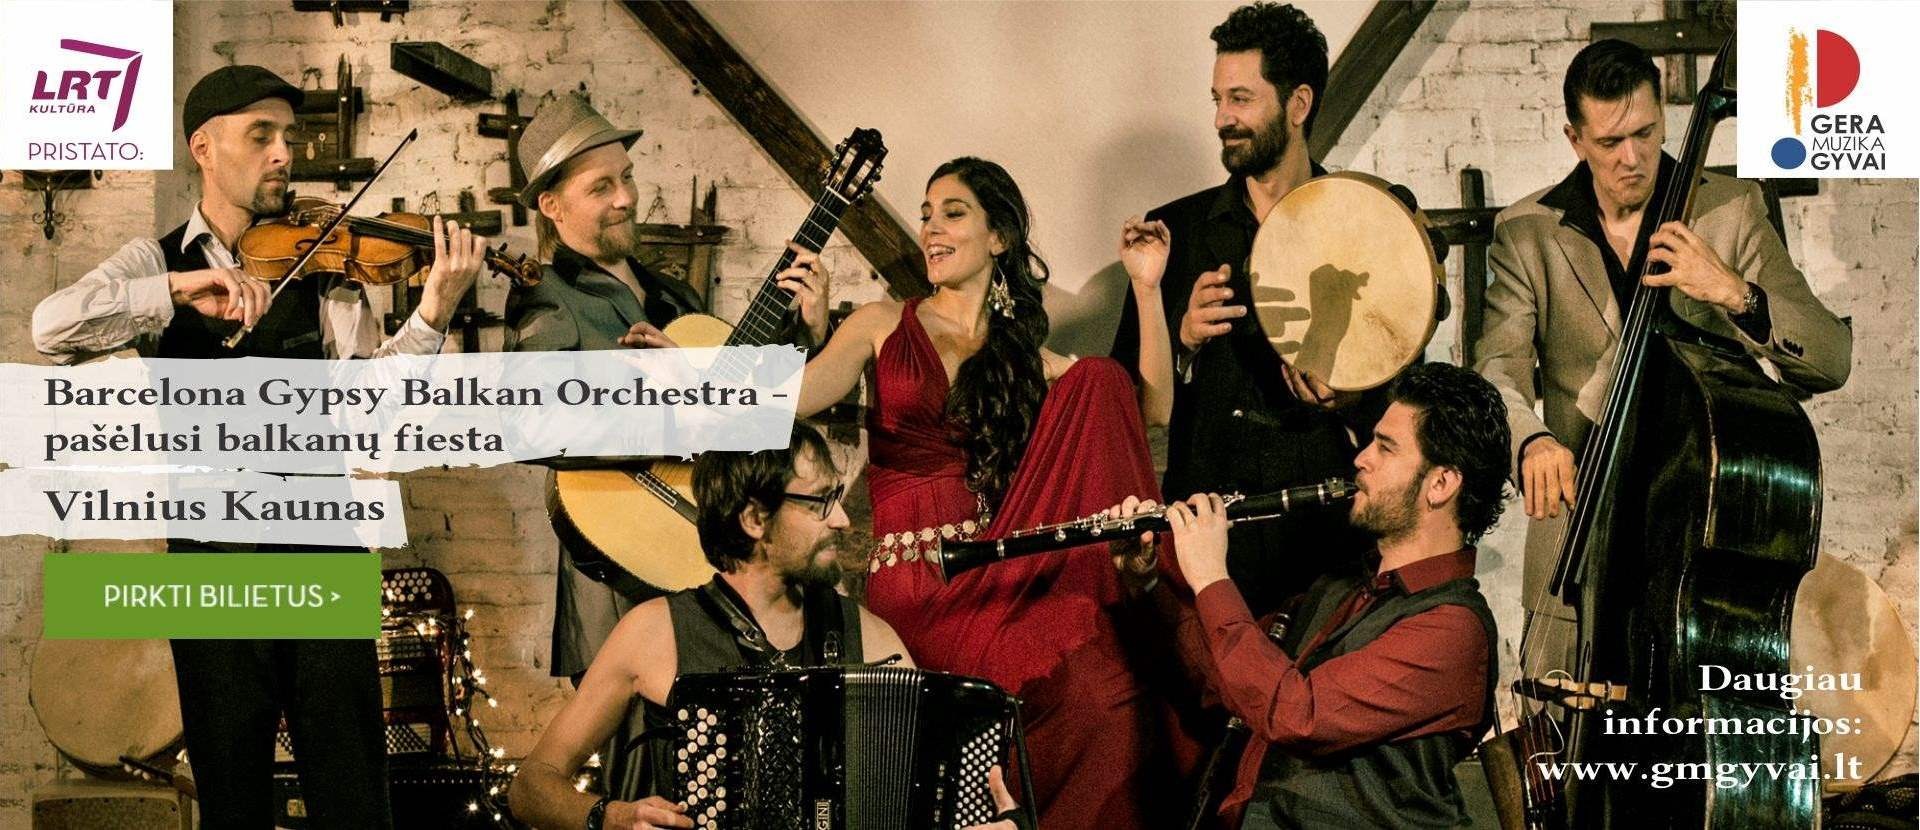 Barcelona Gypsy Balkan Orchestra